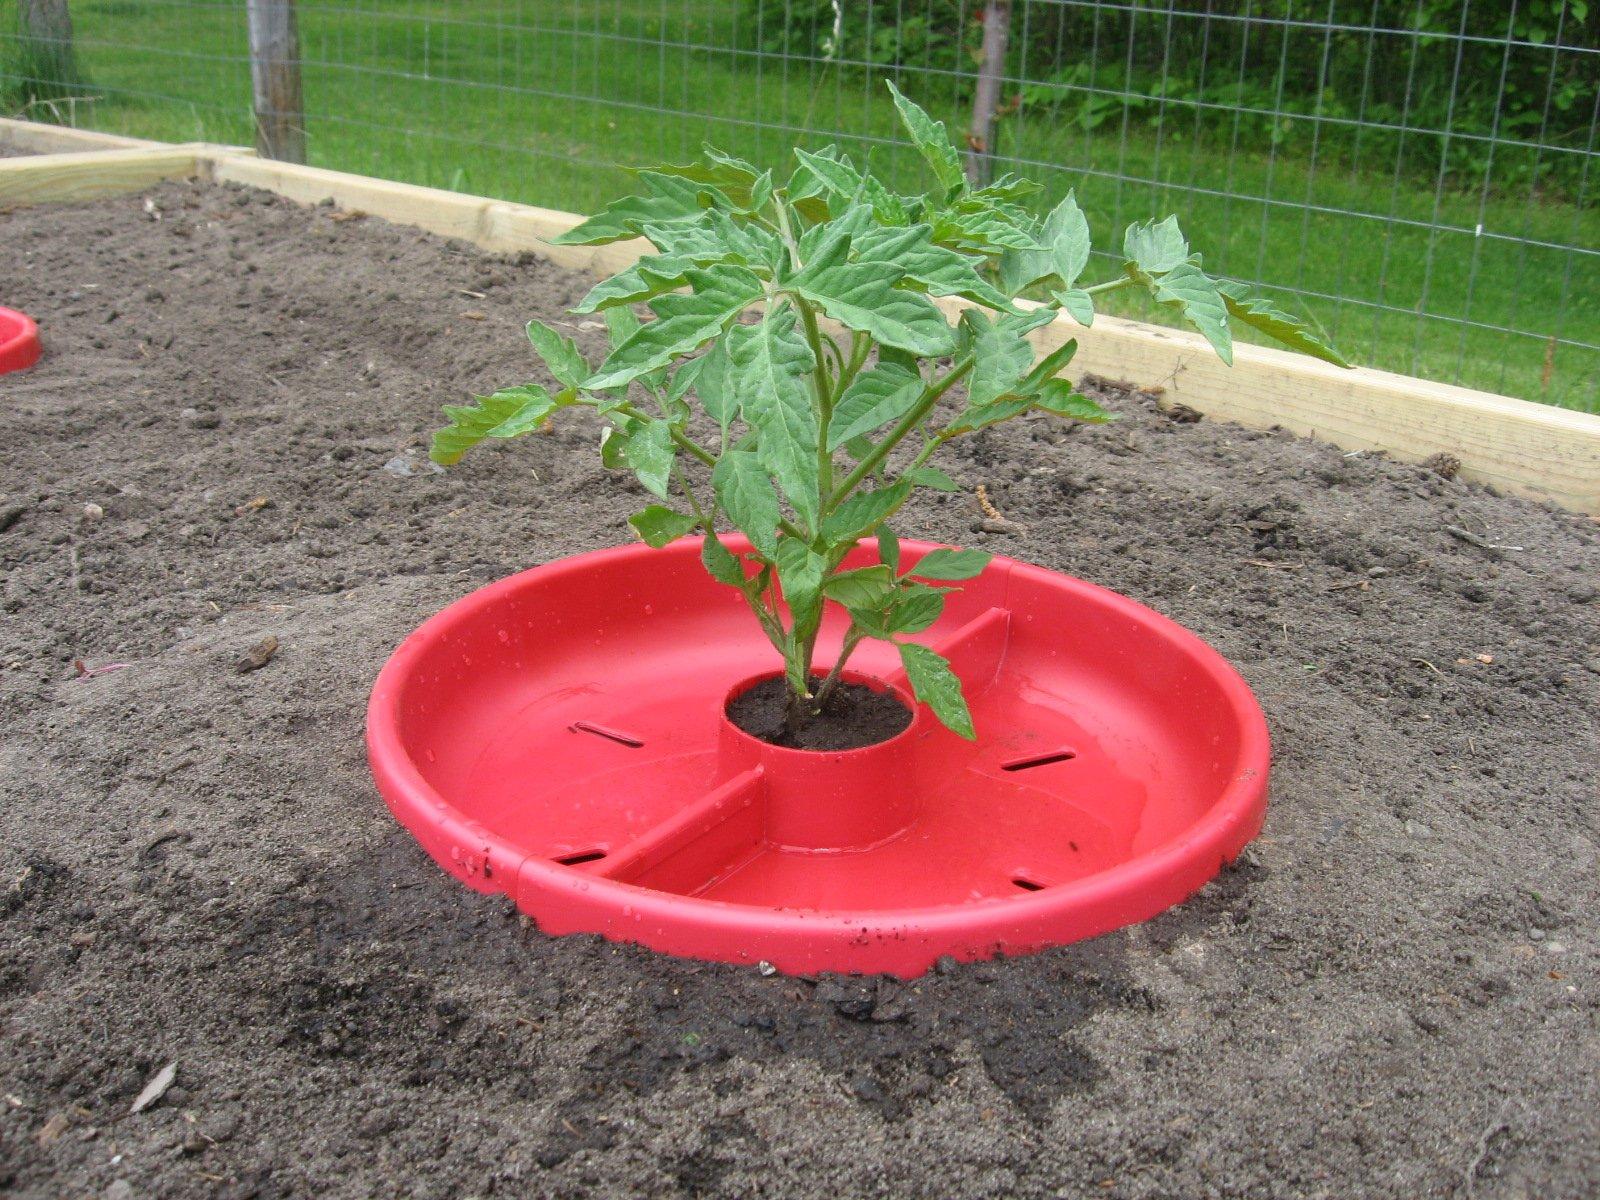 Tomato crater surrounding plant